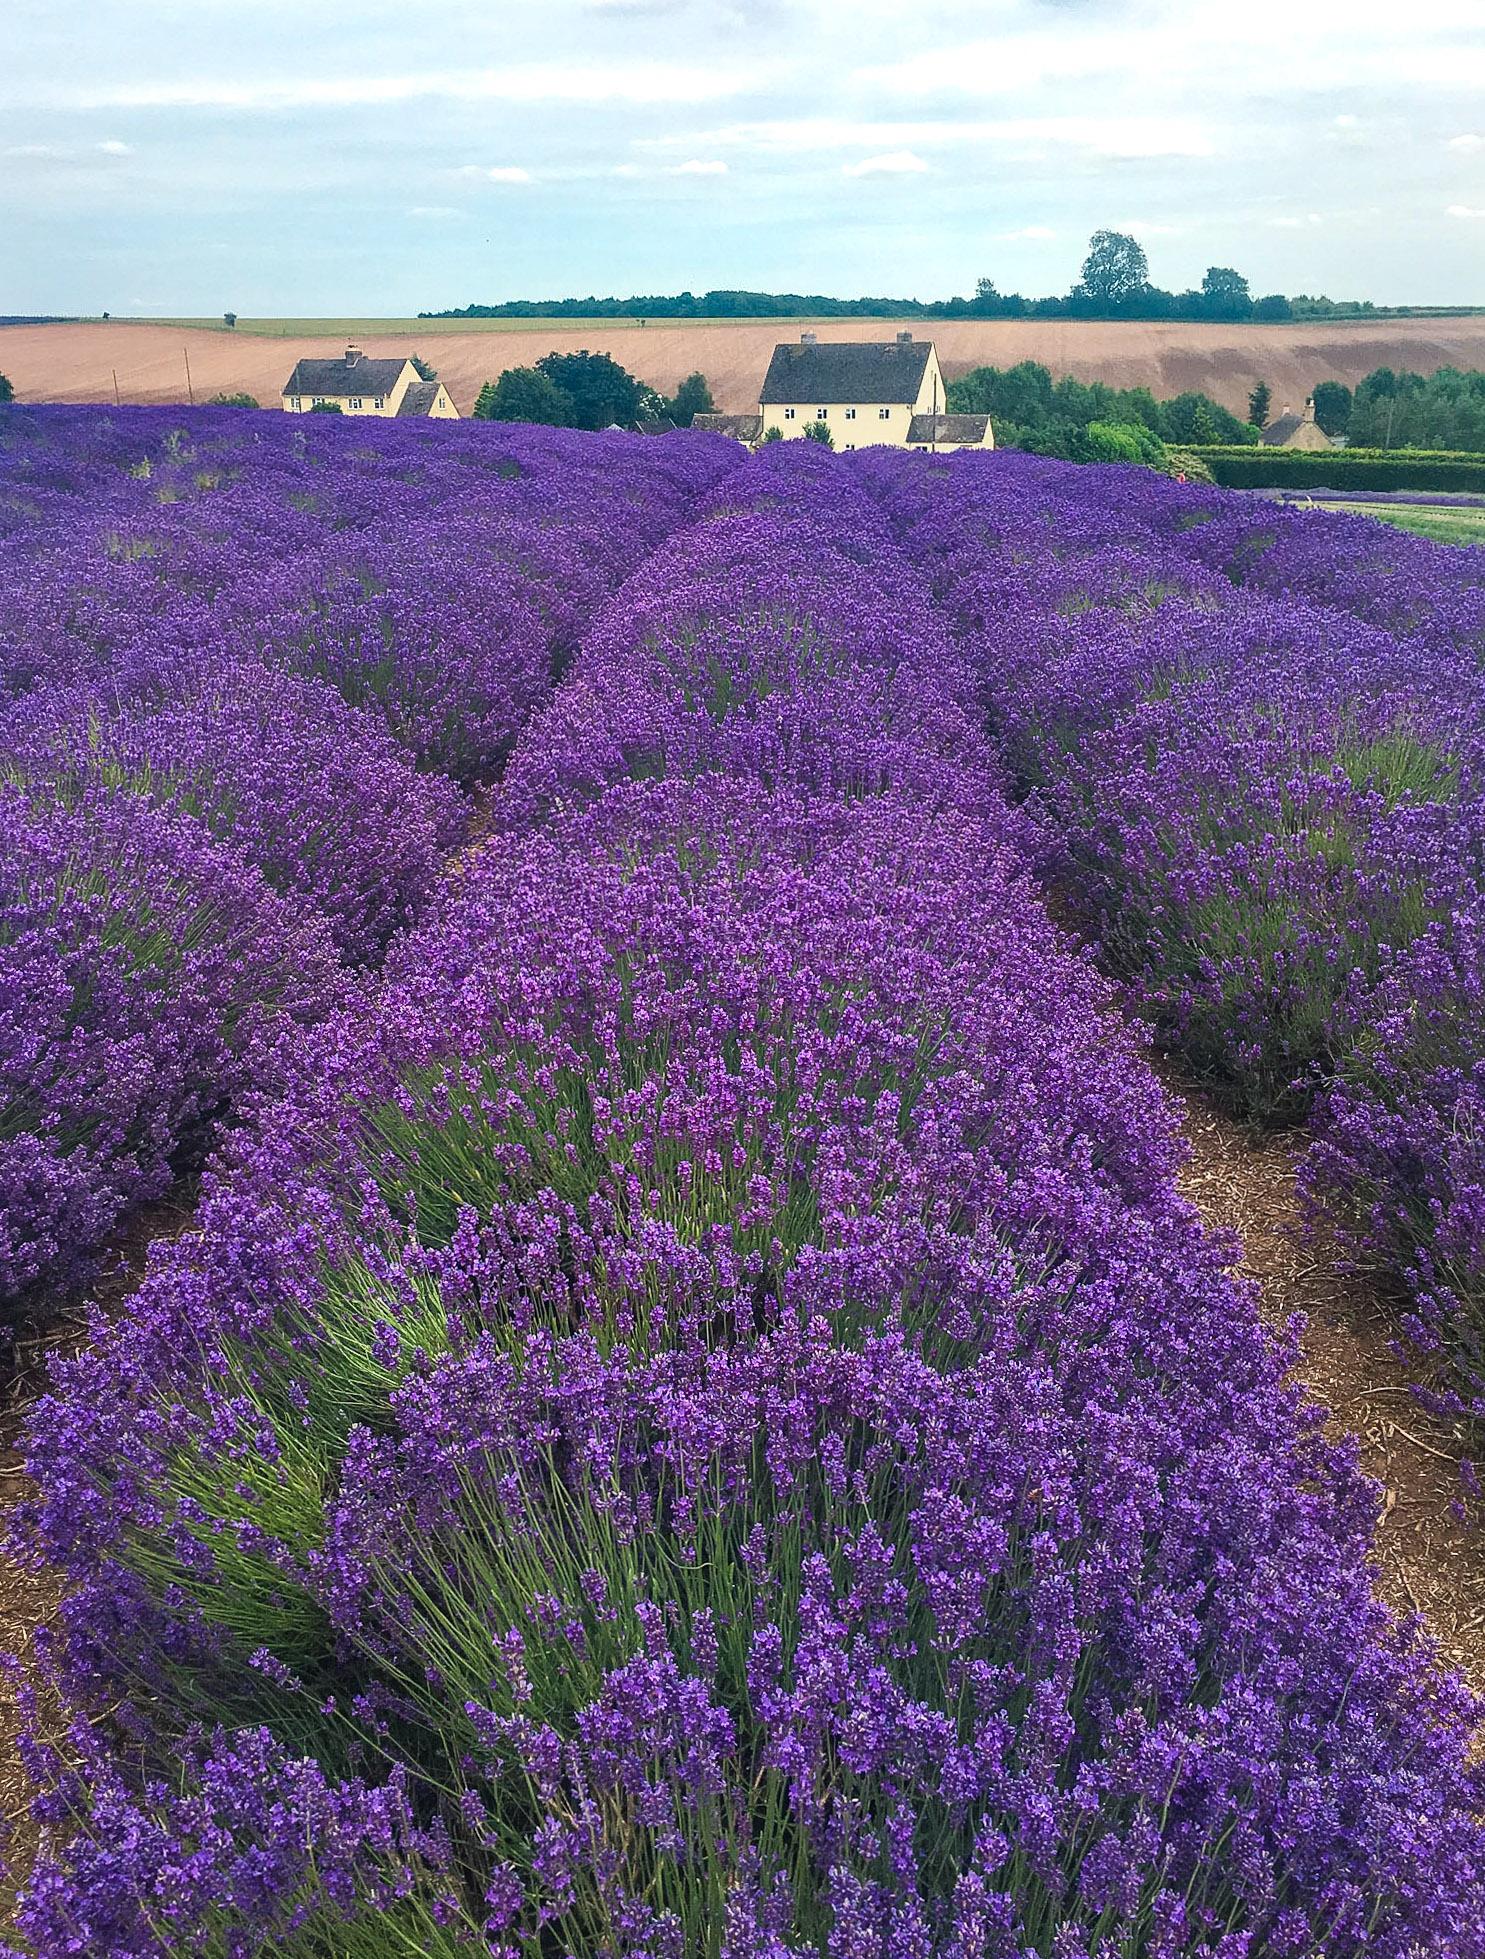 curio.trips.england.lavender.field.house.portrait-2.jpg